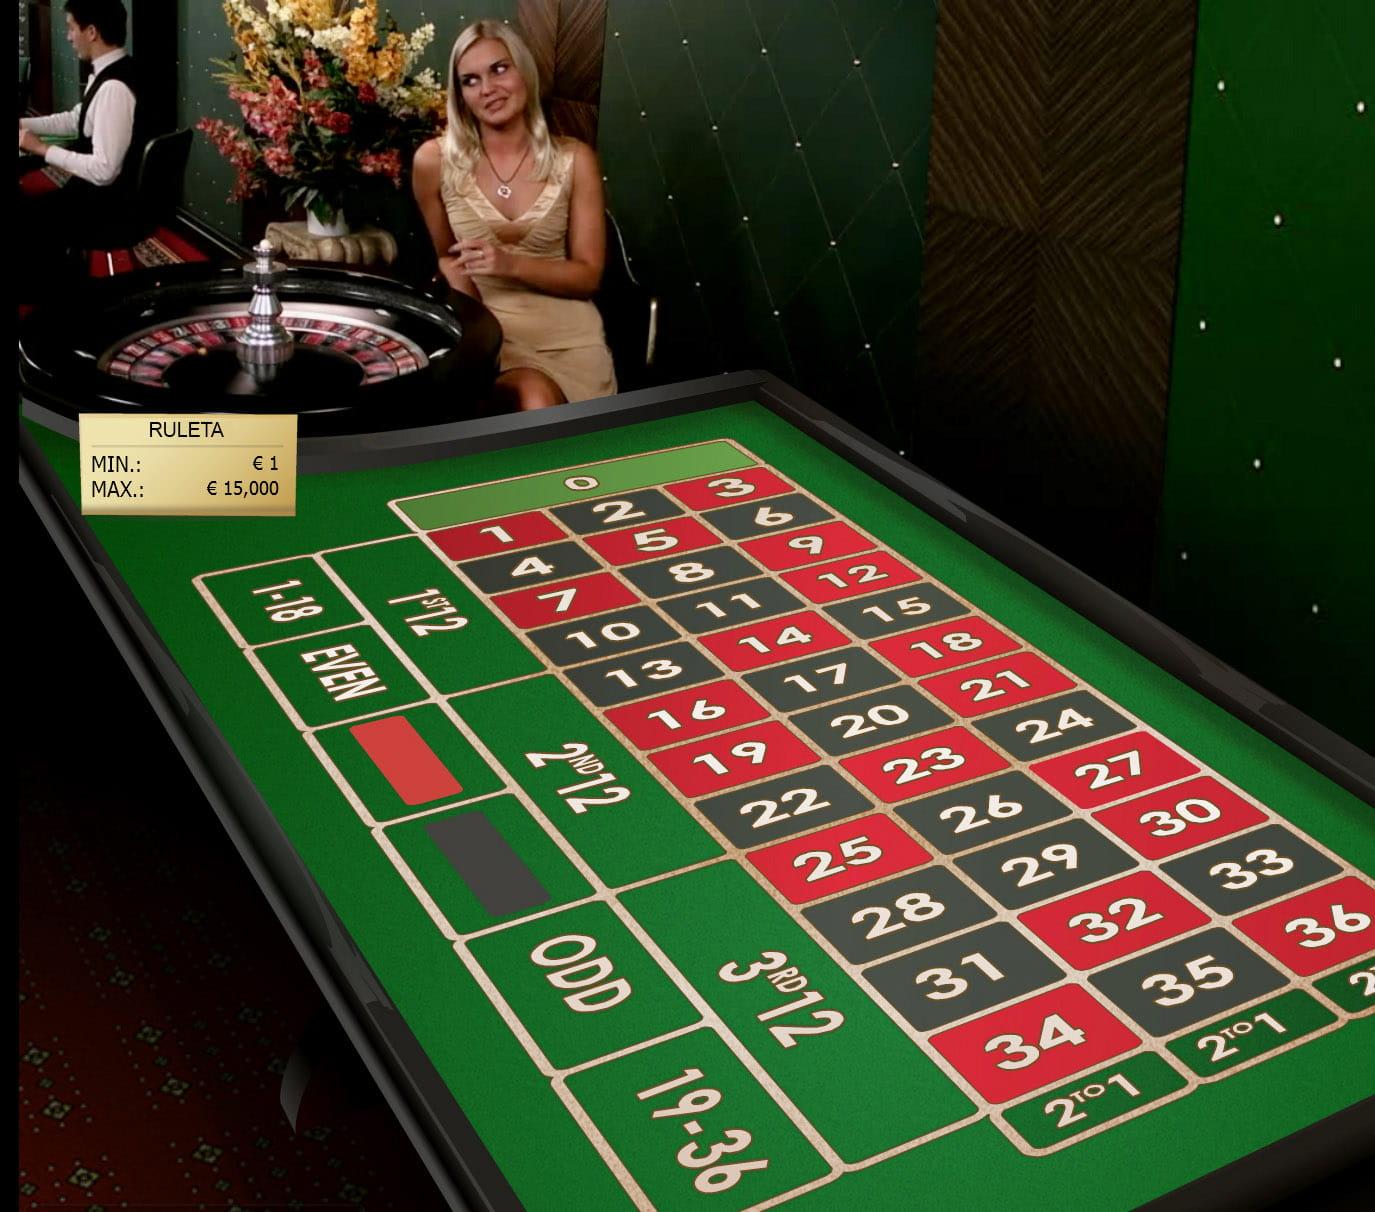 Juega Ruleta Europea Premium Online en Casino.com México